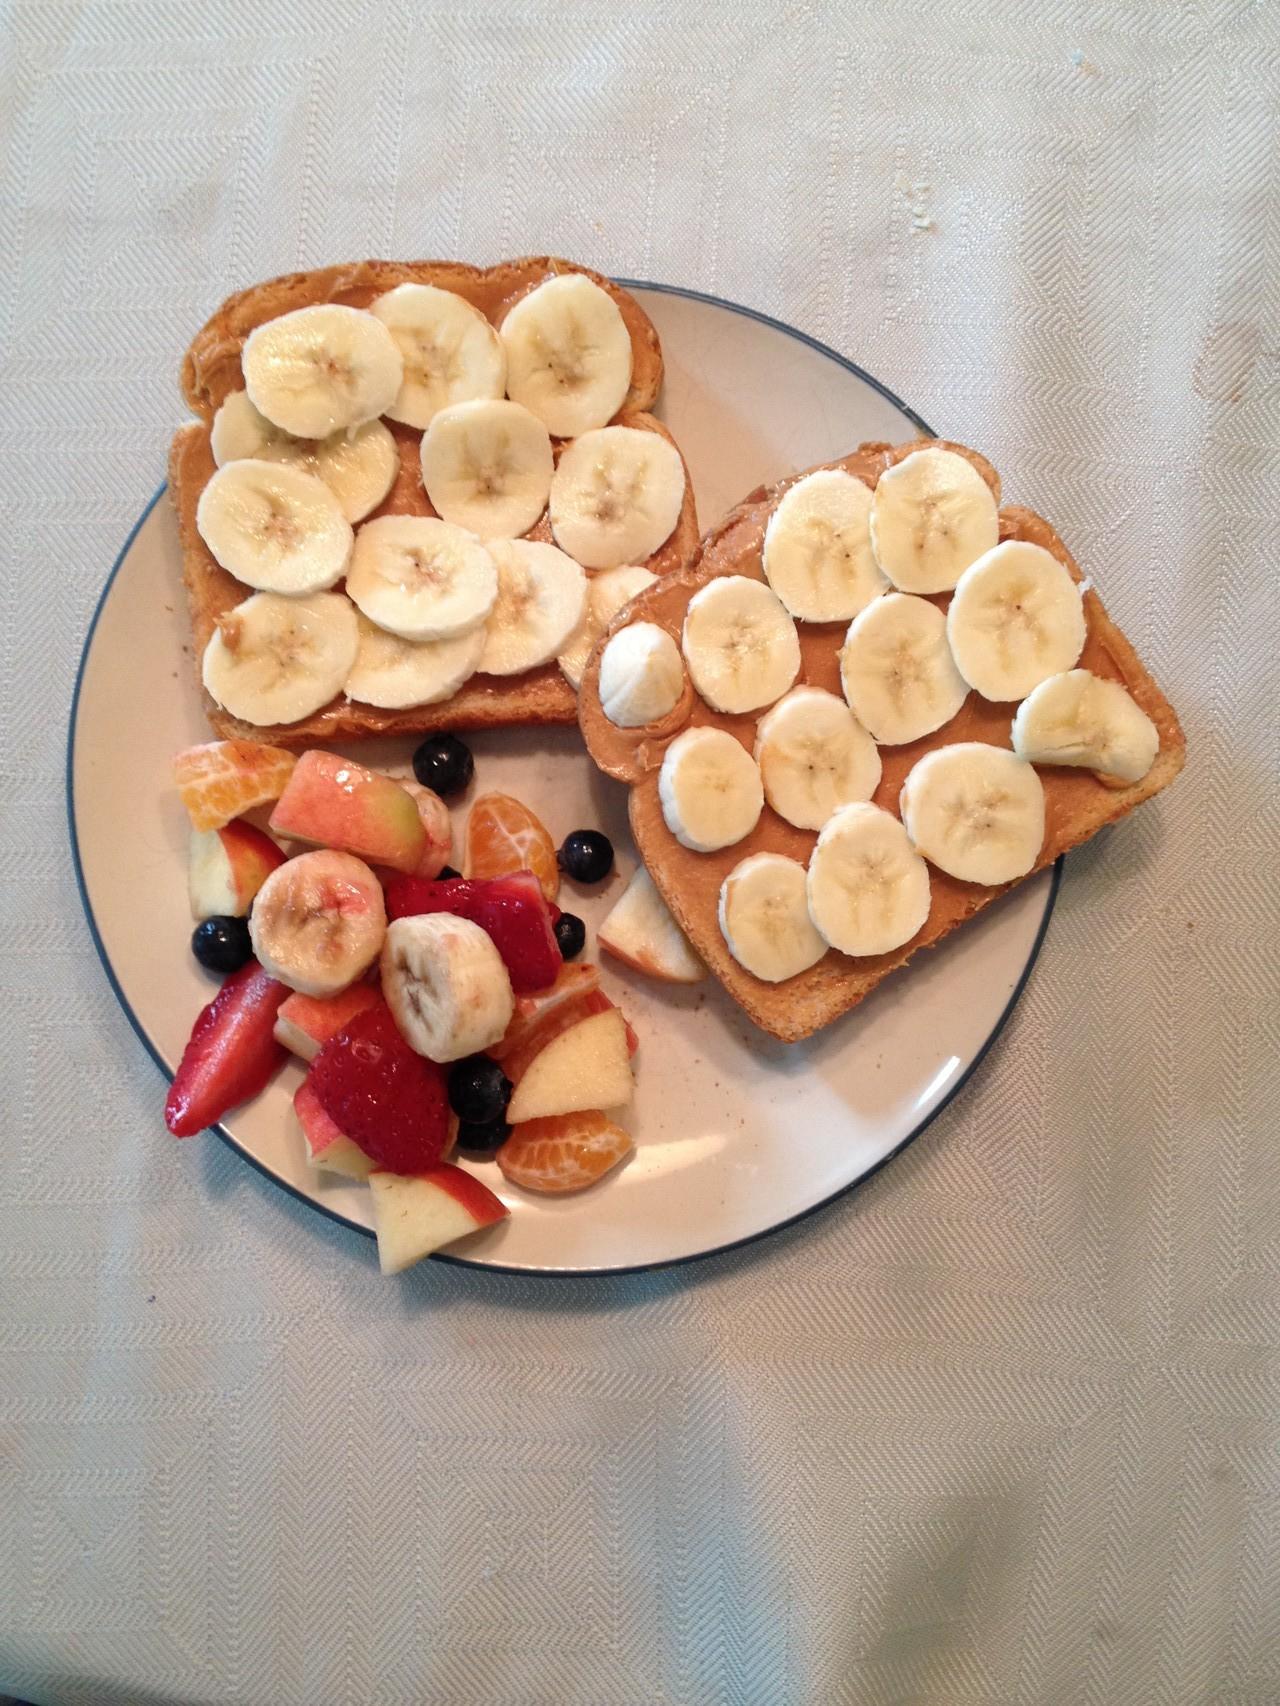 Peanutbutter-Banana-Sandwich mit Früchten